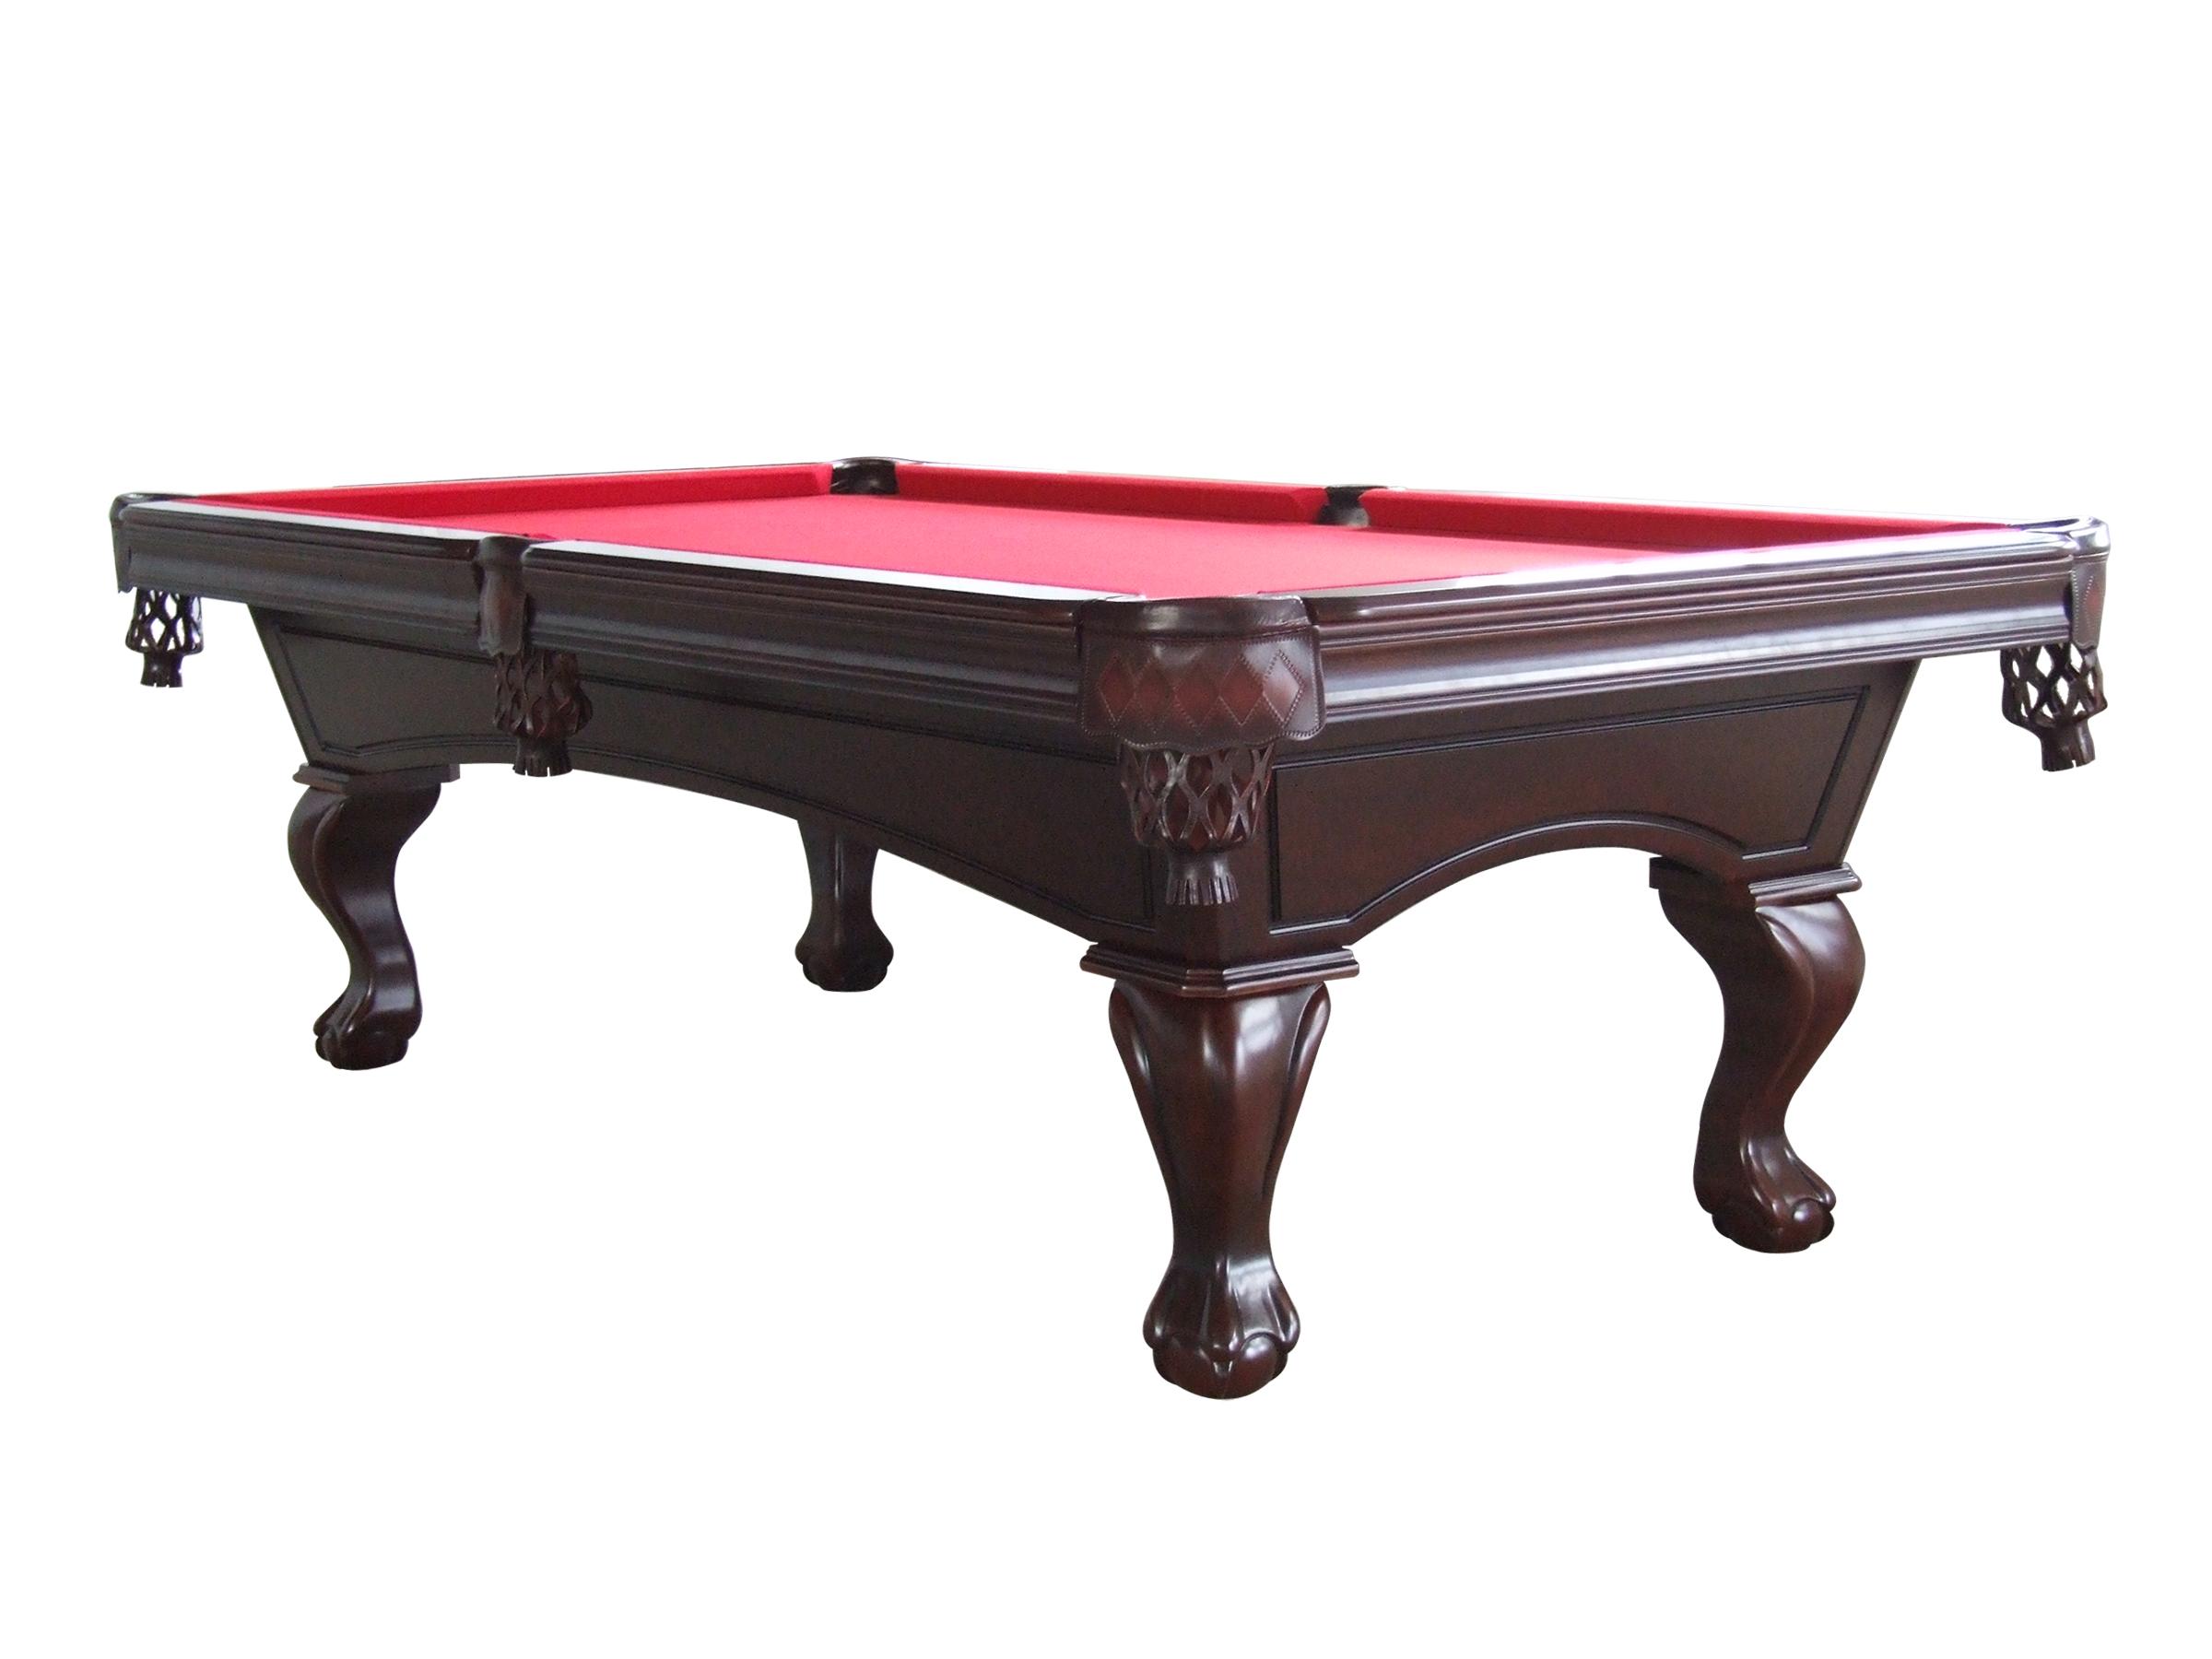 Elite Series Vintage pool table